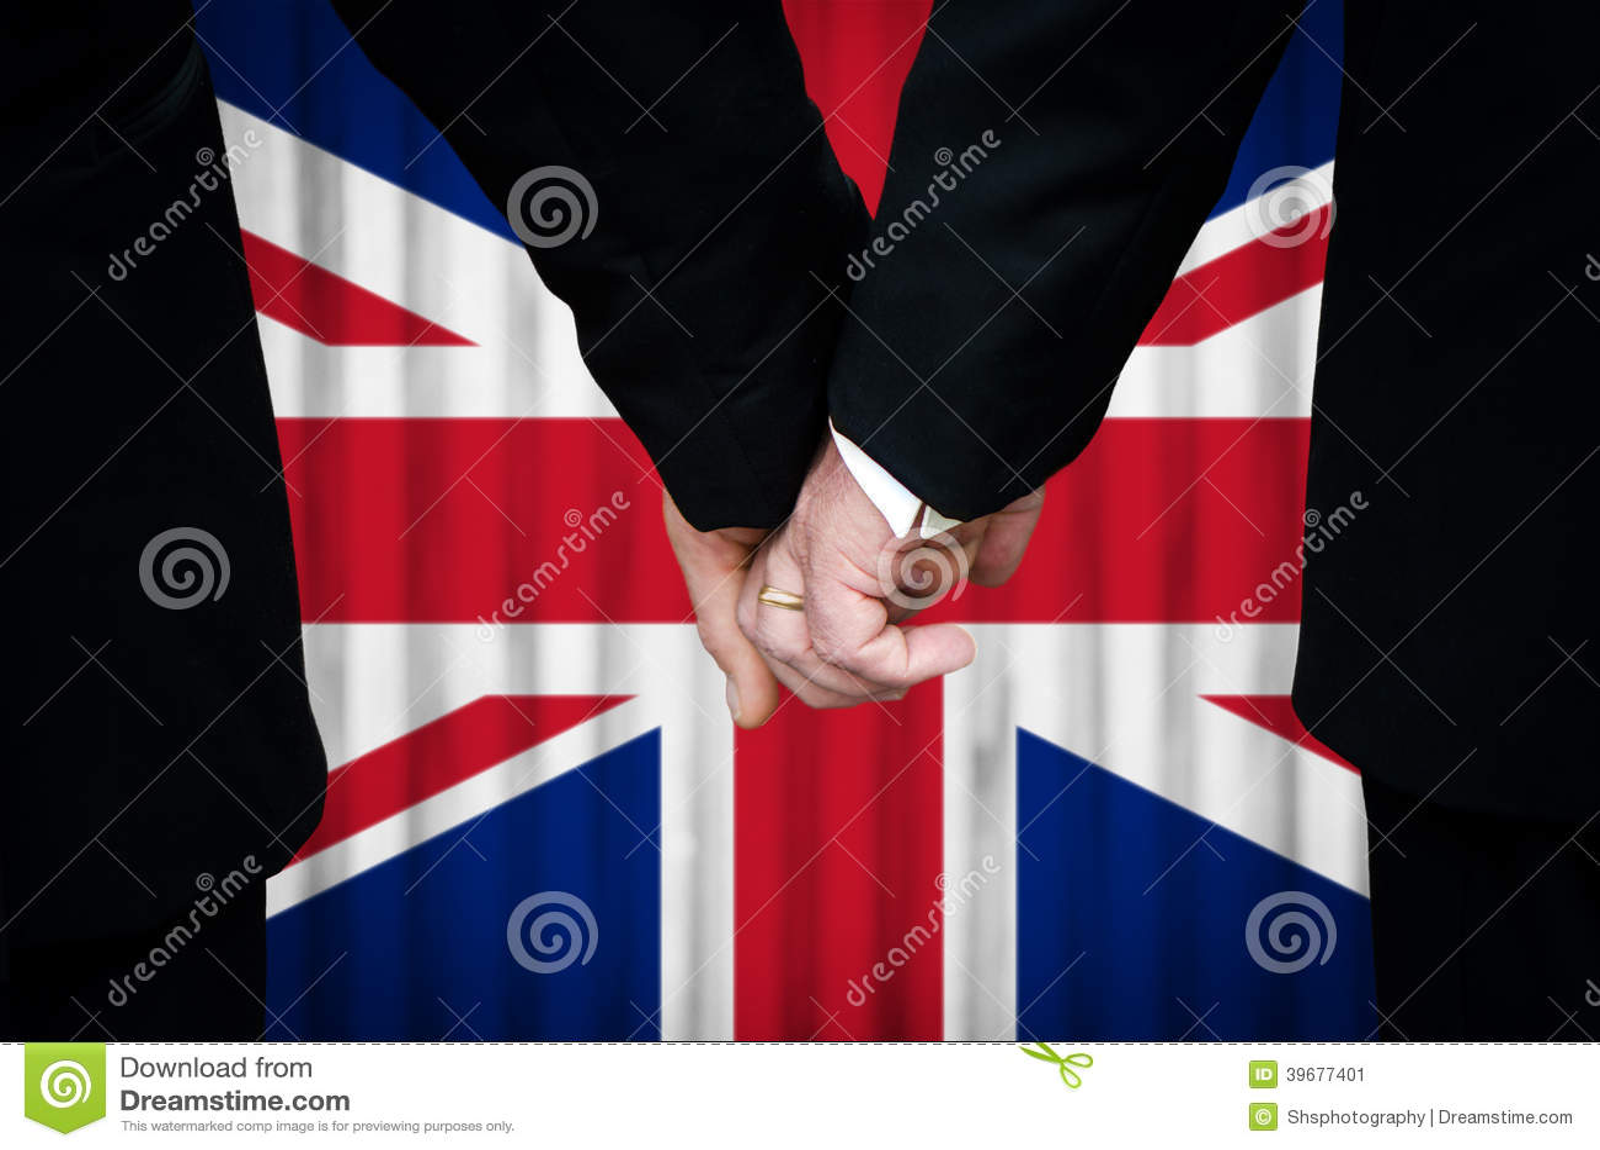 Matrimonio homosexual en Reino Unido